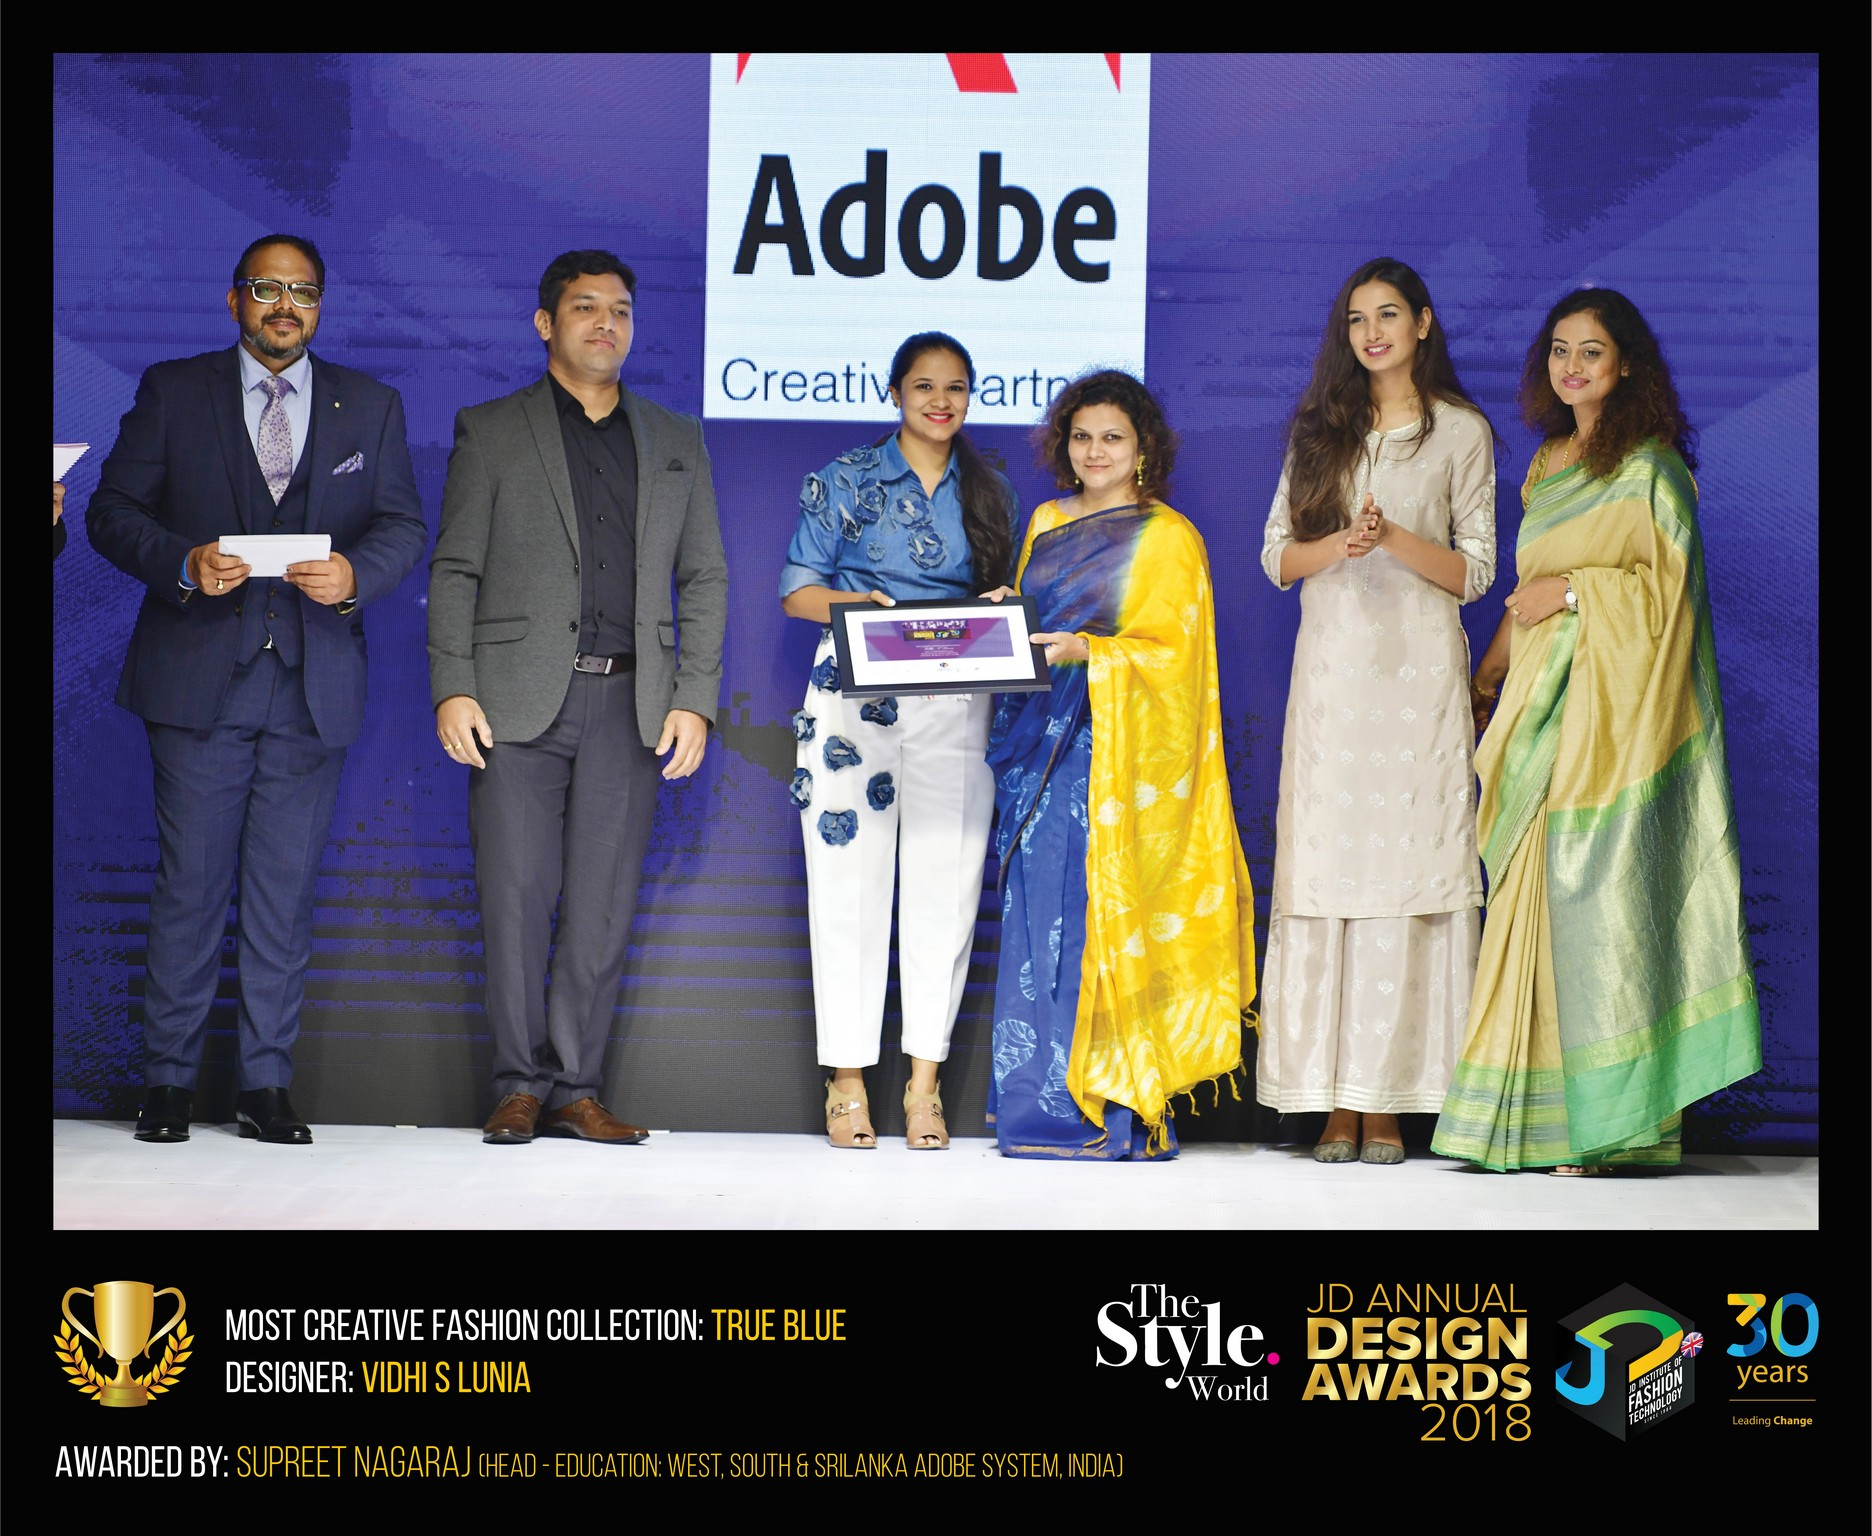 True Blue – Change – JD Annual Design Awards 2018 | Designer: Vidhi Lunia (ADFD 2015) | Photography : Jerin Nath (@jerin_nath) true blue - 1 - True Blue – Change – JD Annual Design Awards 2018